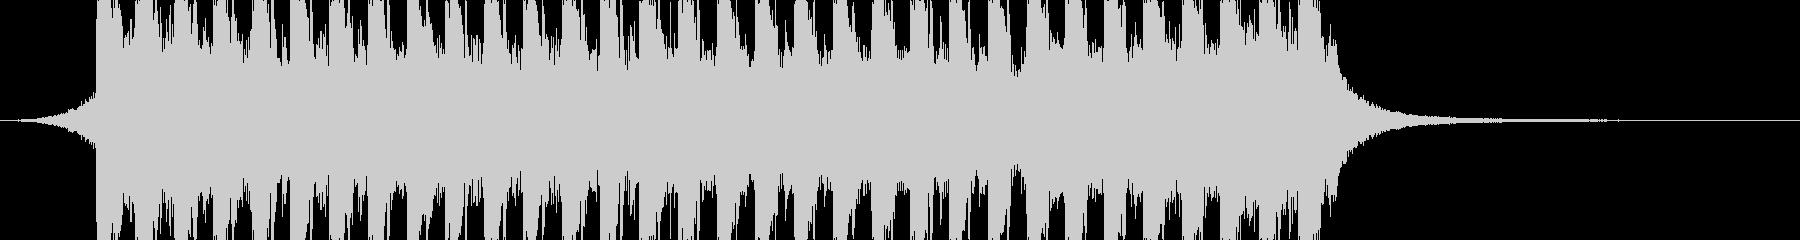 Tropical House 3の未再生の波形